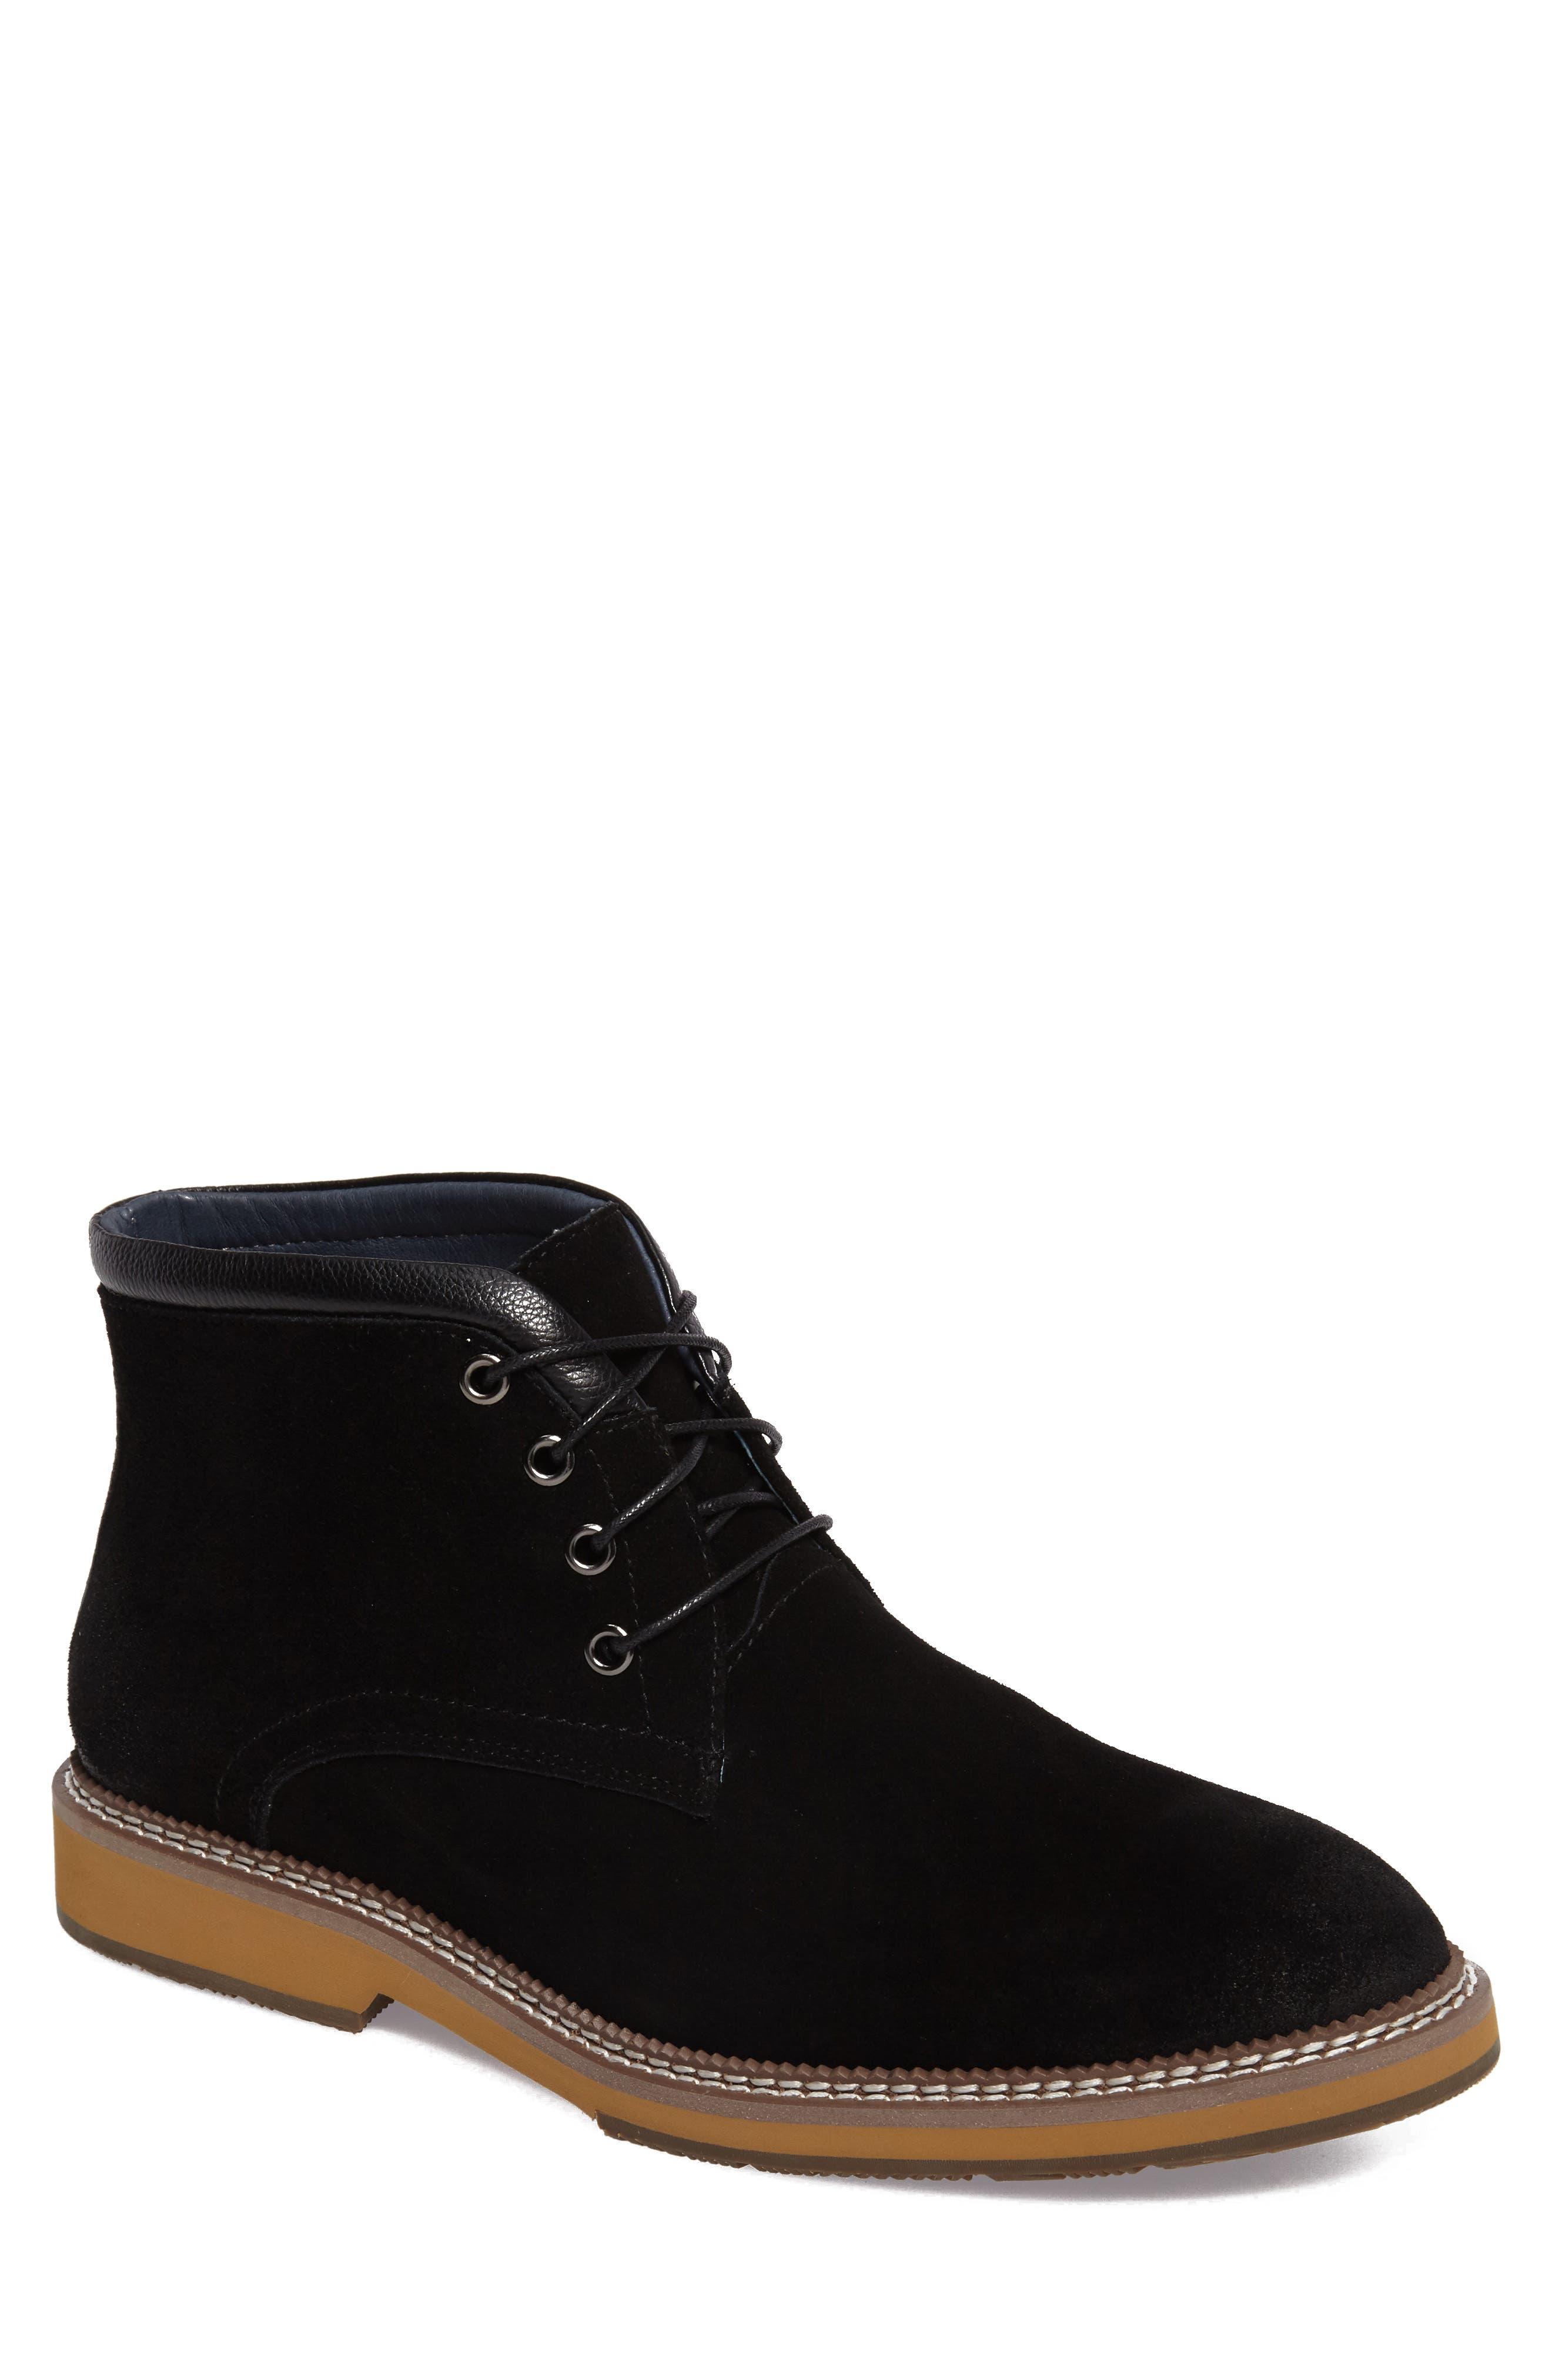 Lazo Chukka Boot,                             Main thumbnail 1, color,                             Black Leather